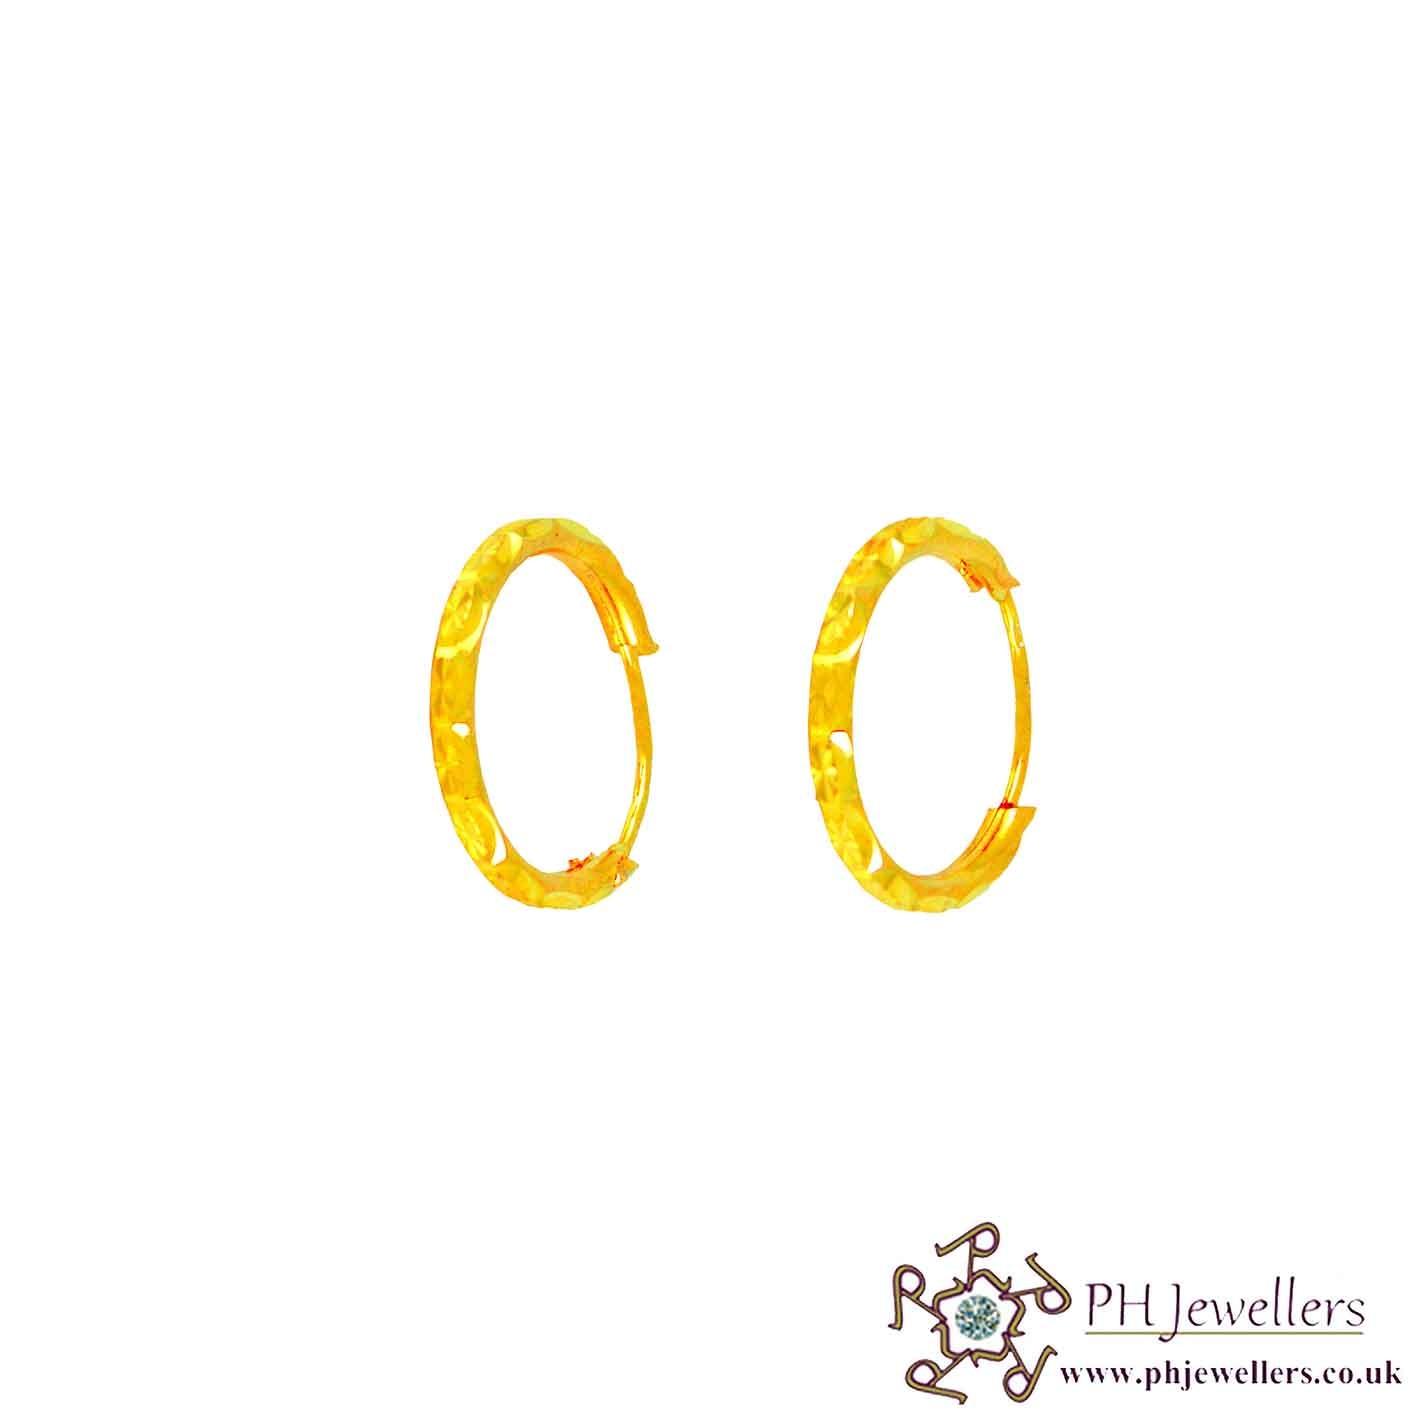 22ct 916 Hallmark Yellow Gold Bali Earrings BE13